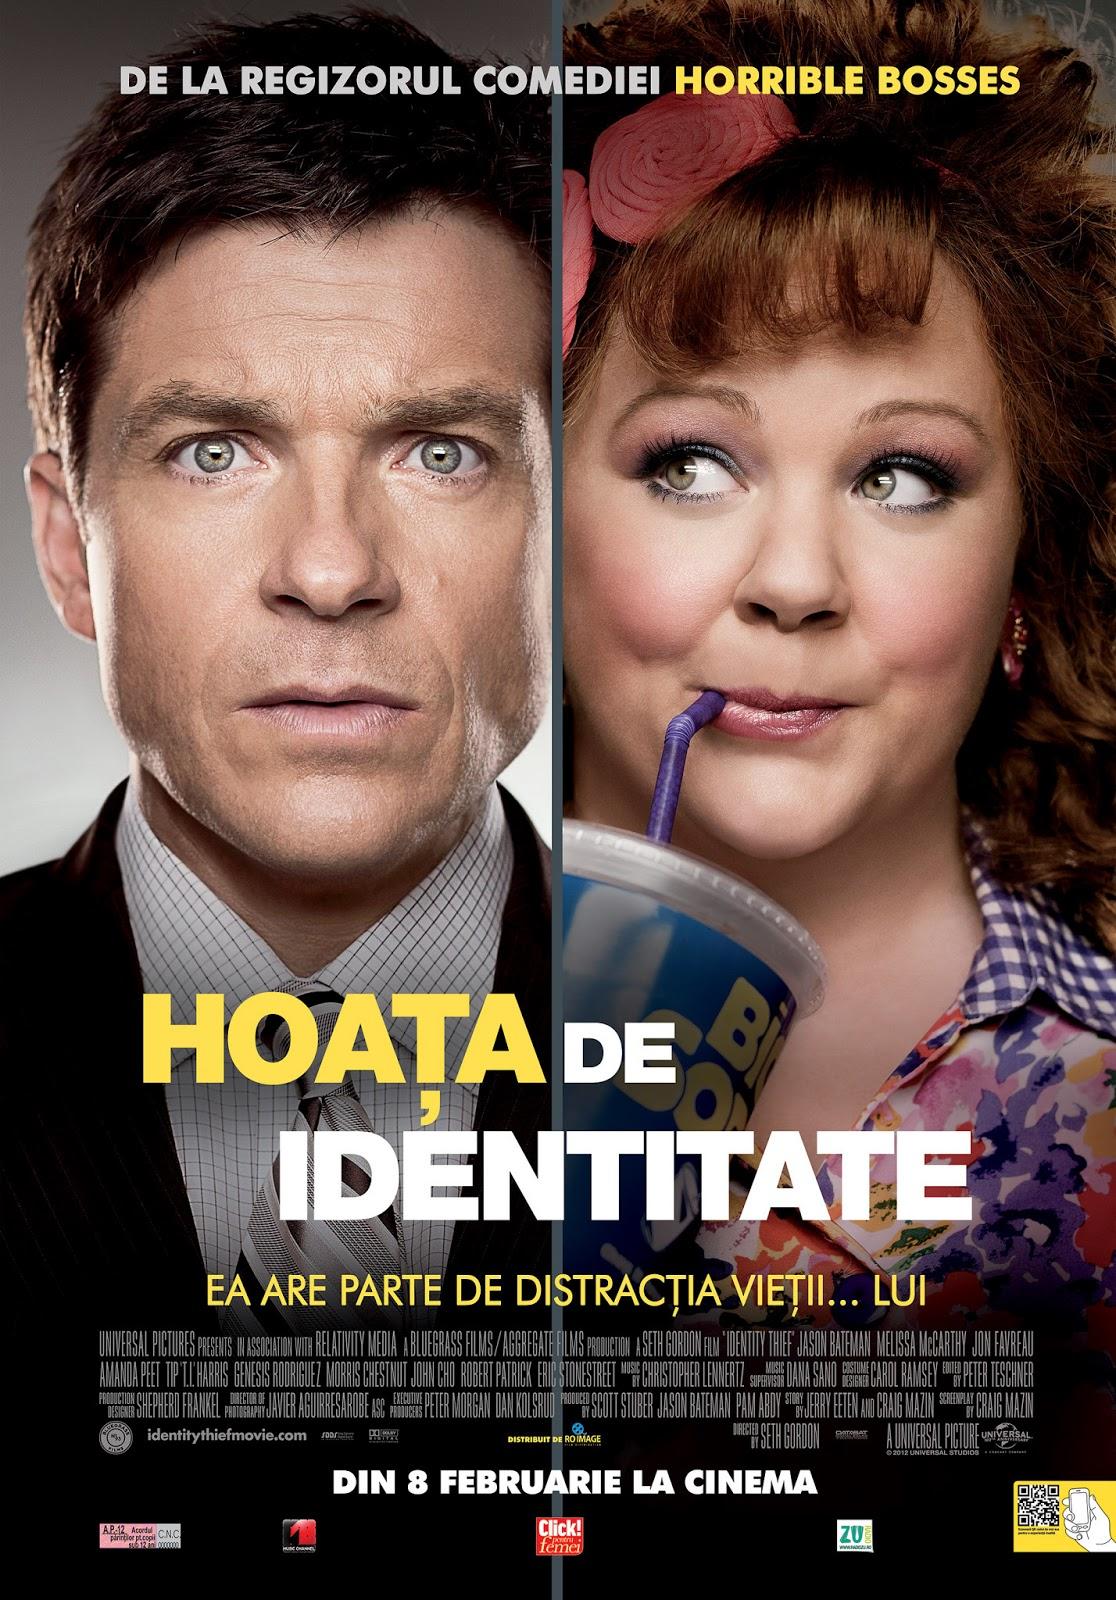 identity thief movie quotes - photo #31